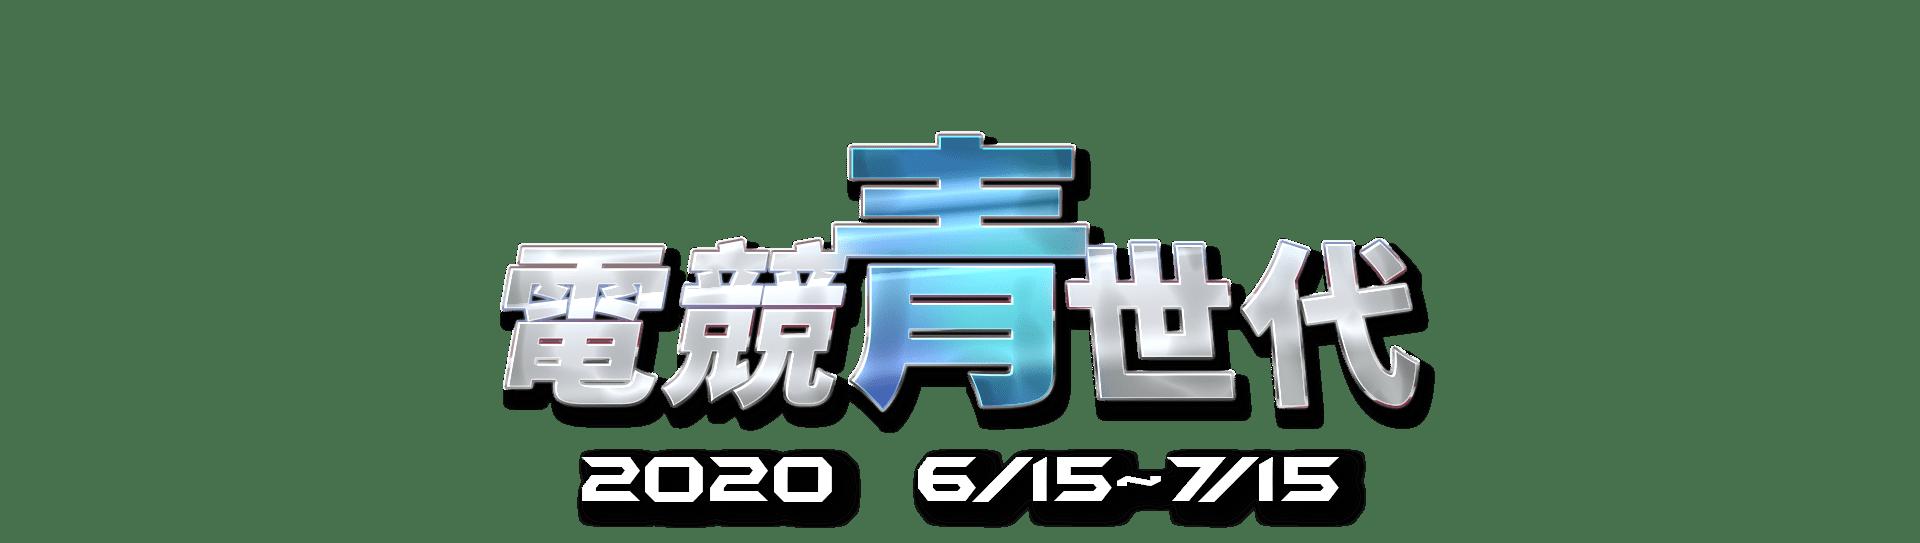 msi-2020電競青世代